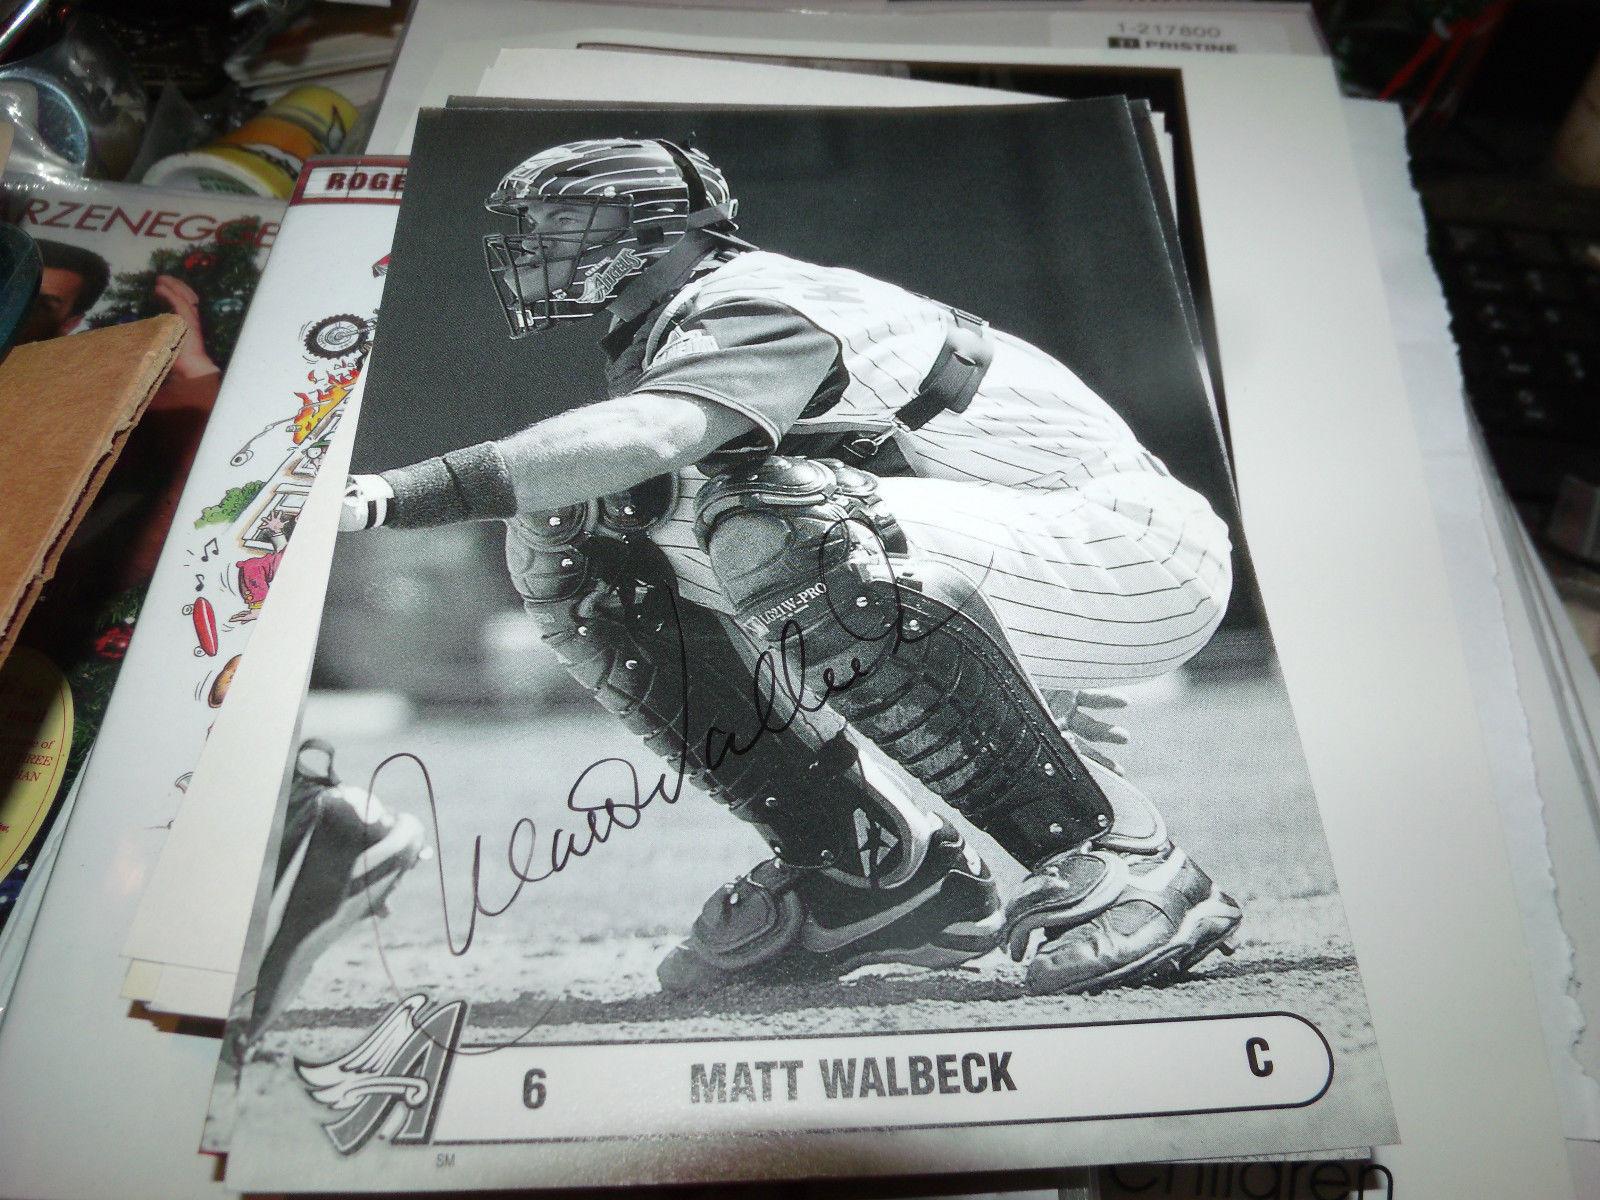 MATT WALBECK HAND SIGNED 5X7 PHOTO CARD ANGELS BASEBALL